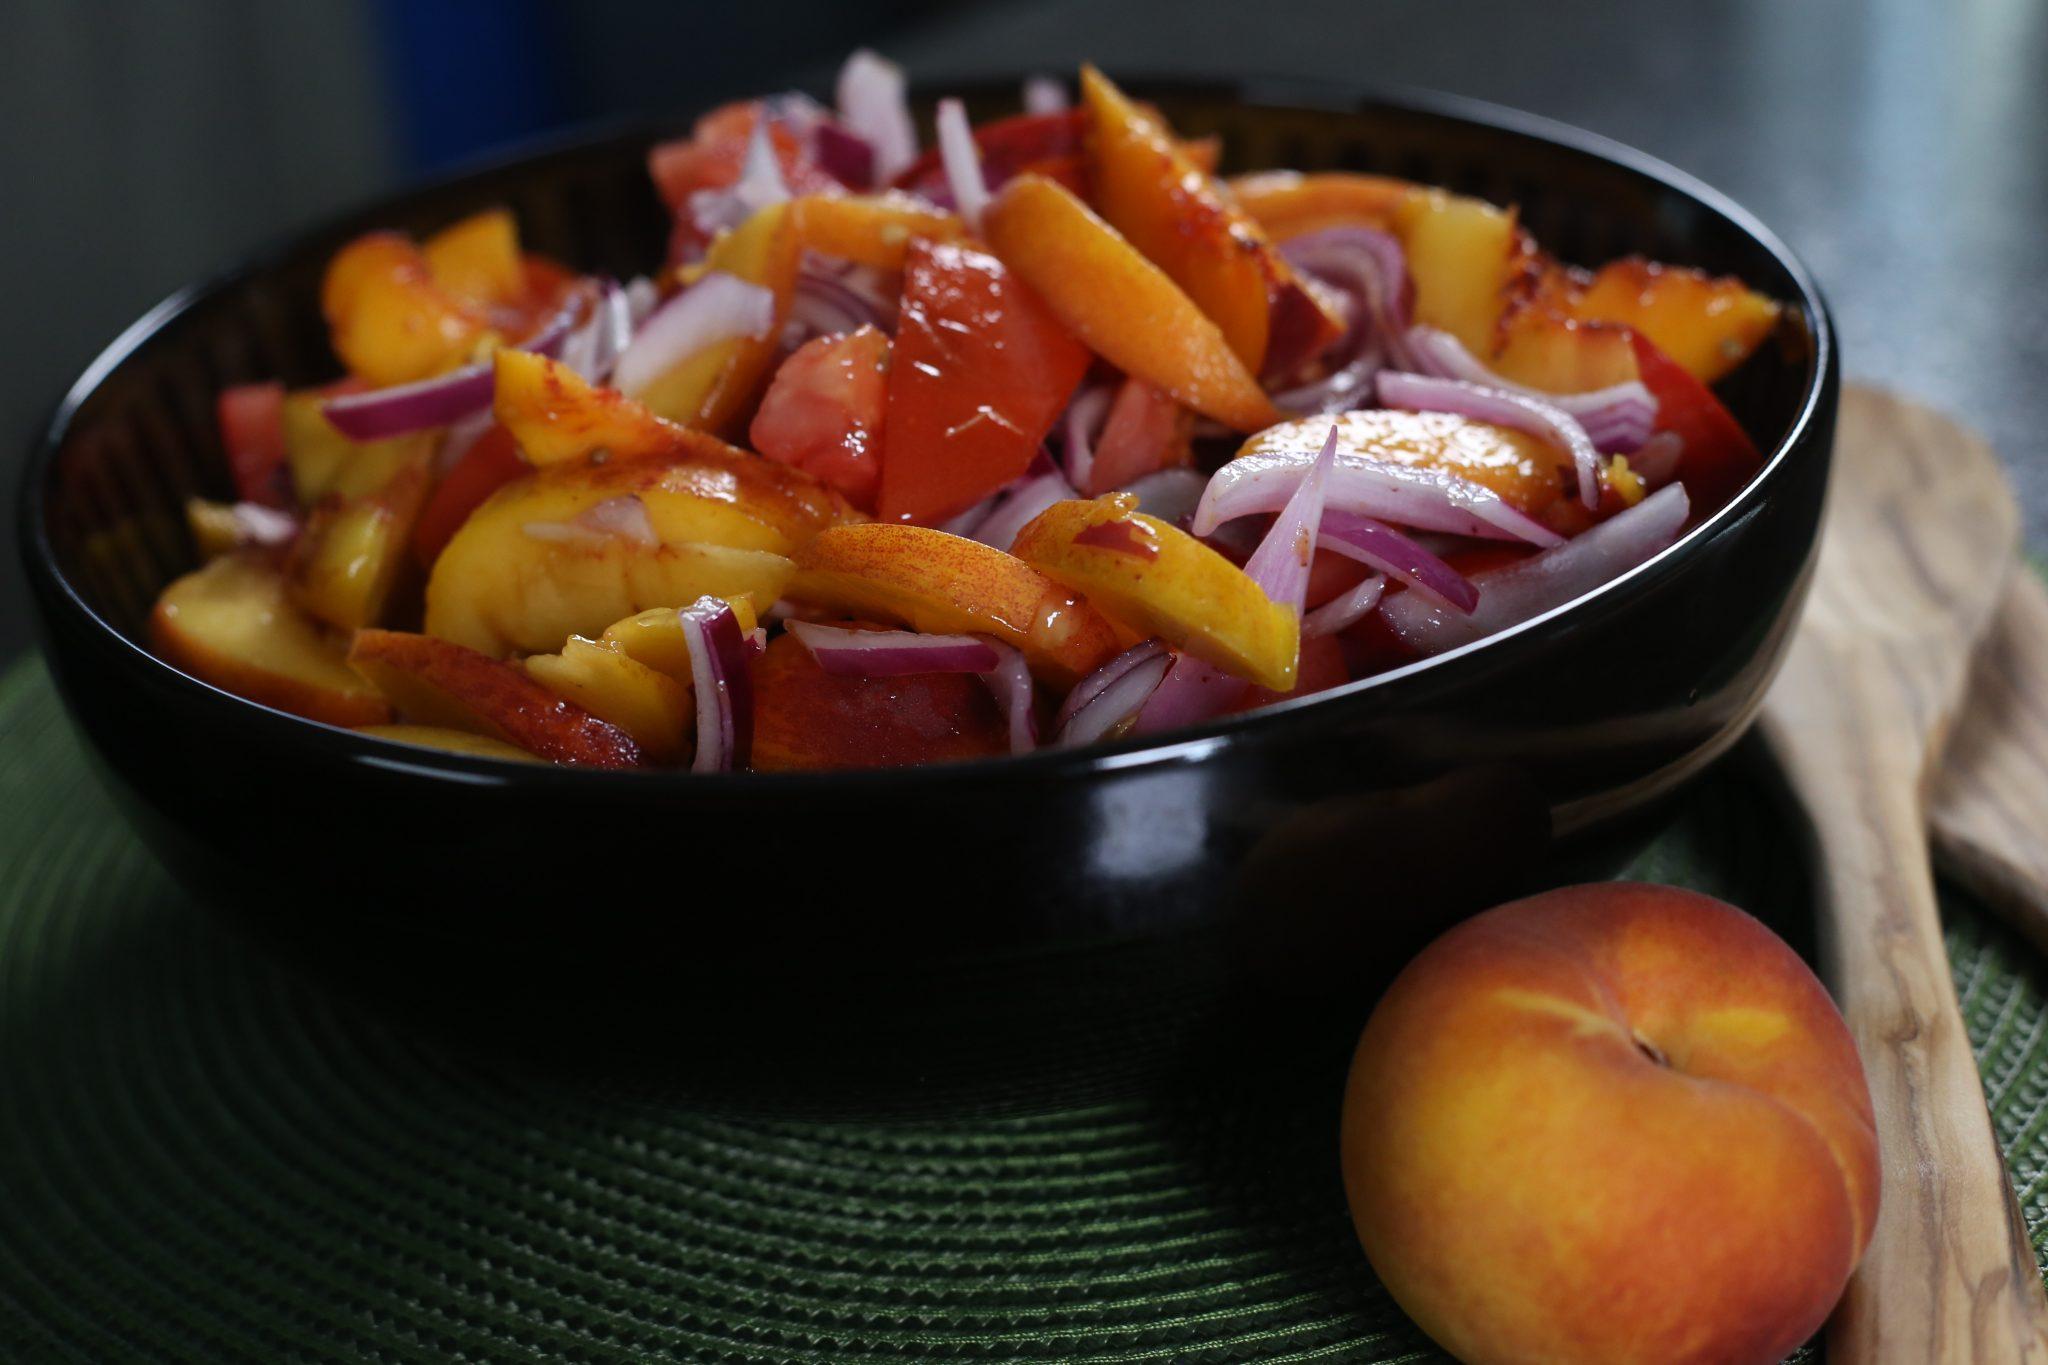 Salad, food in black bowl